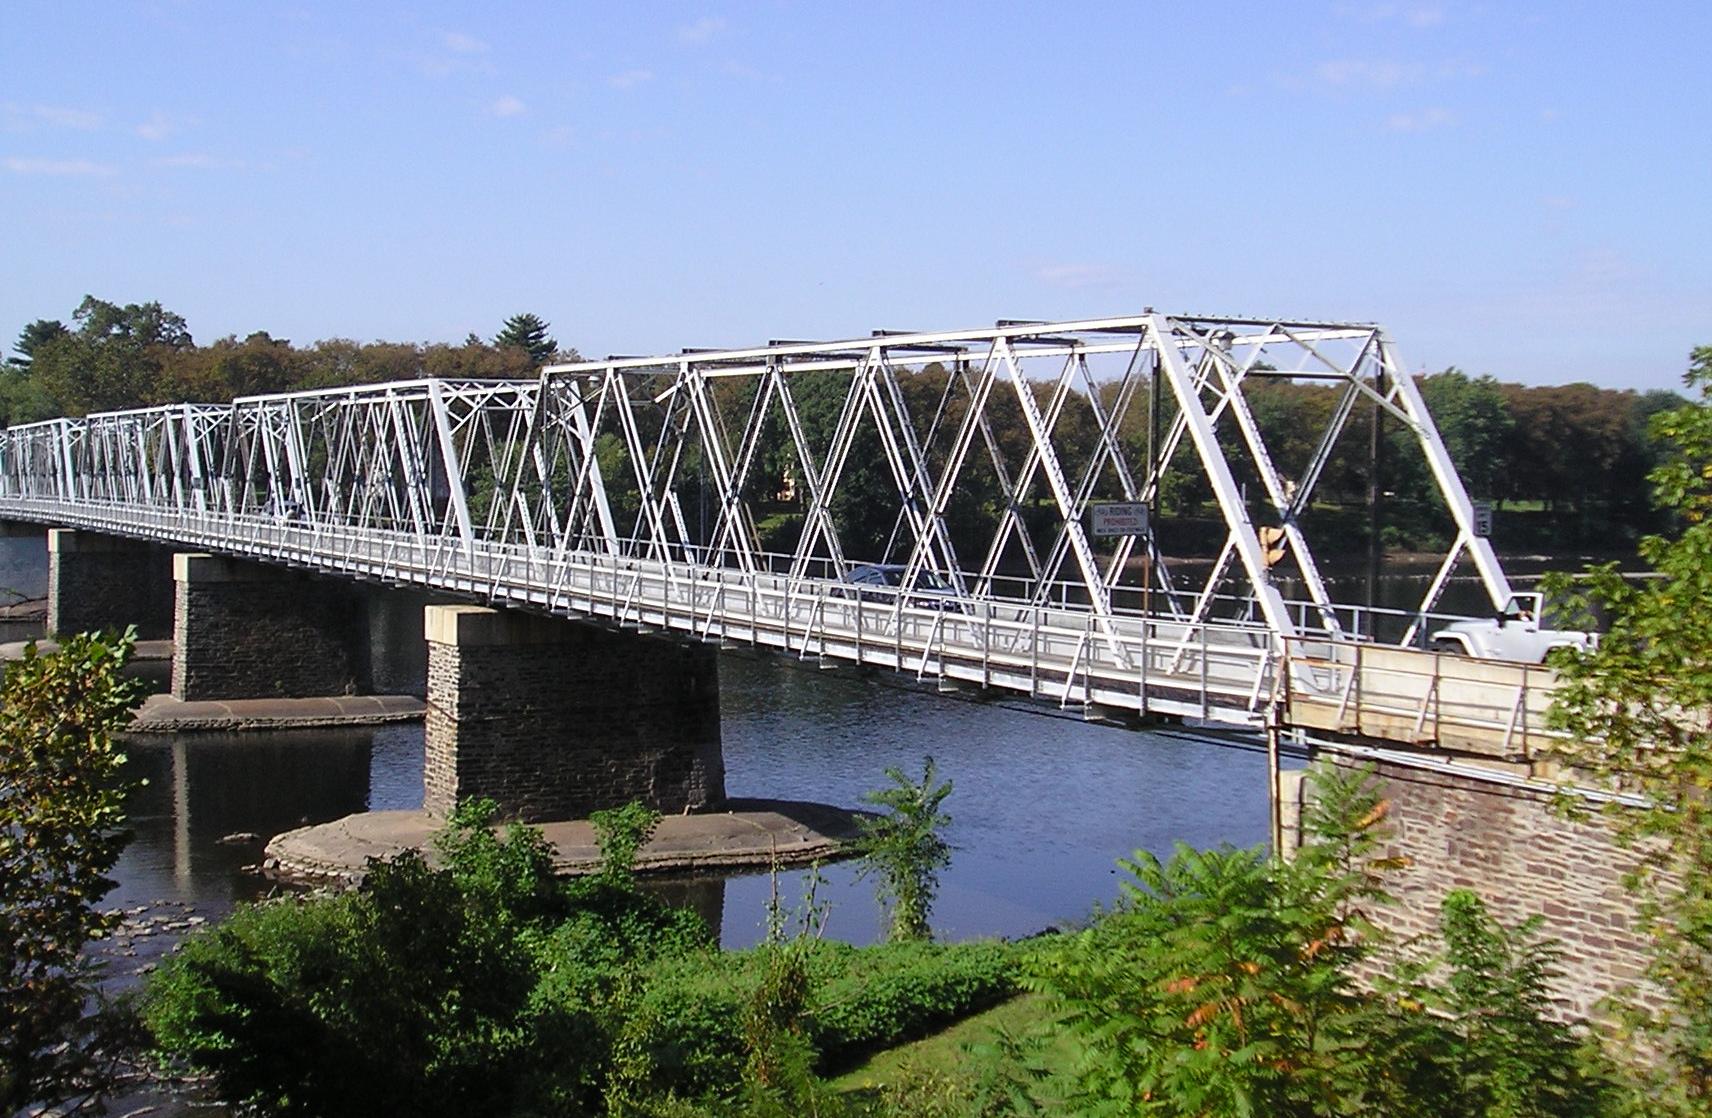 Washington_s Crossing Bridge between Upper Makefield Township_ Pennsylvania and  Hopewell Township_ New Jersey